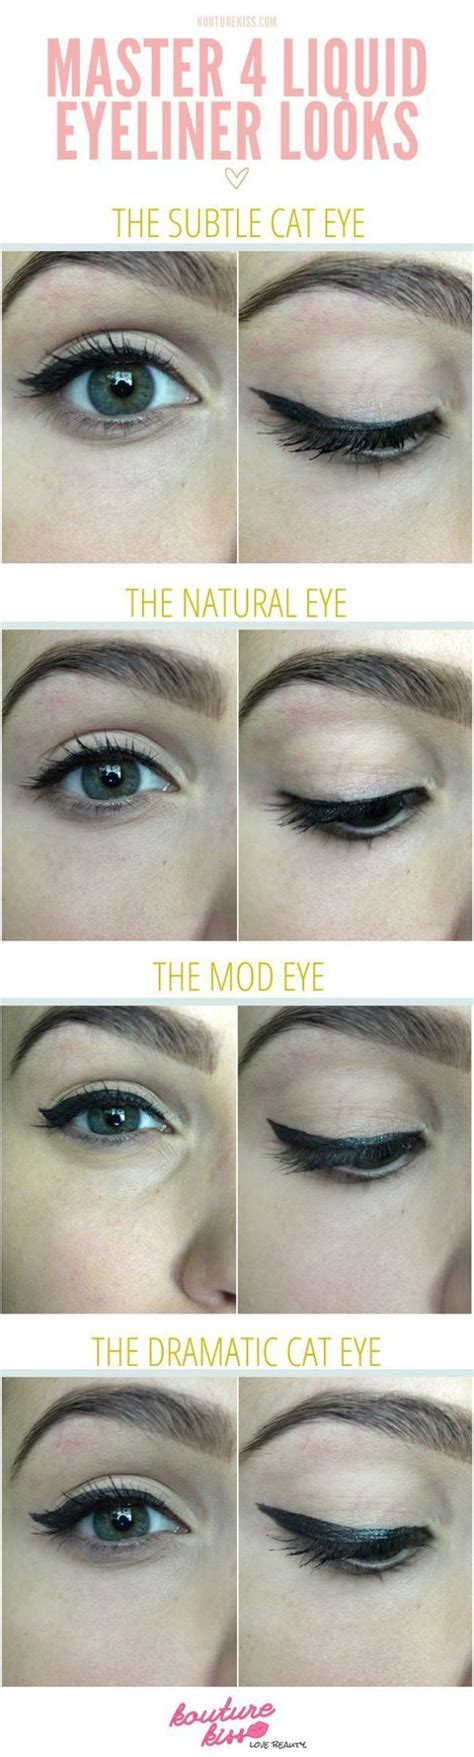 liquid eyeliner tutorial dailymotion 20 liquid eyeliner hacks tips and tricks for the perfect